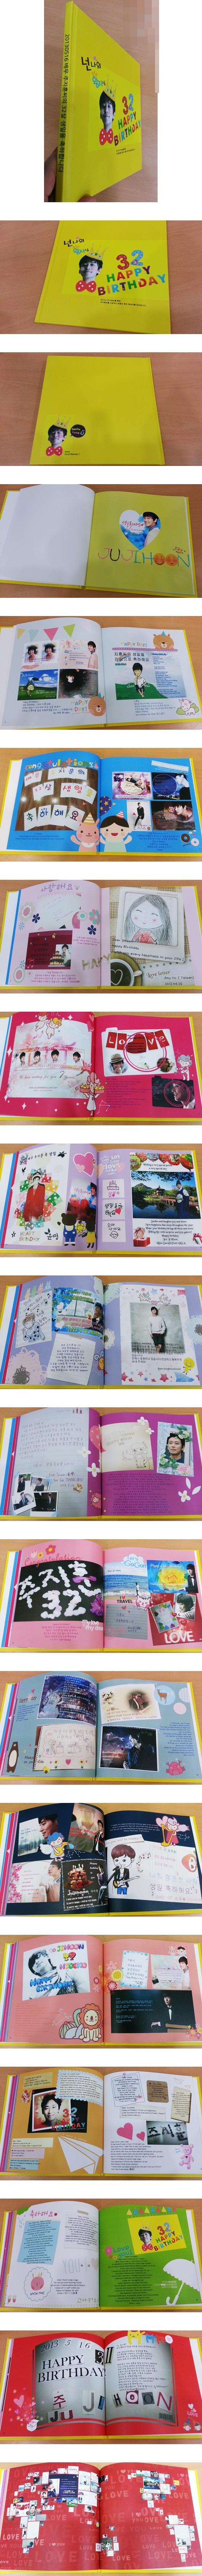 20130516_photo_book